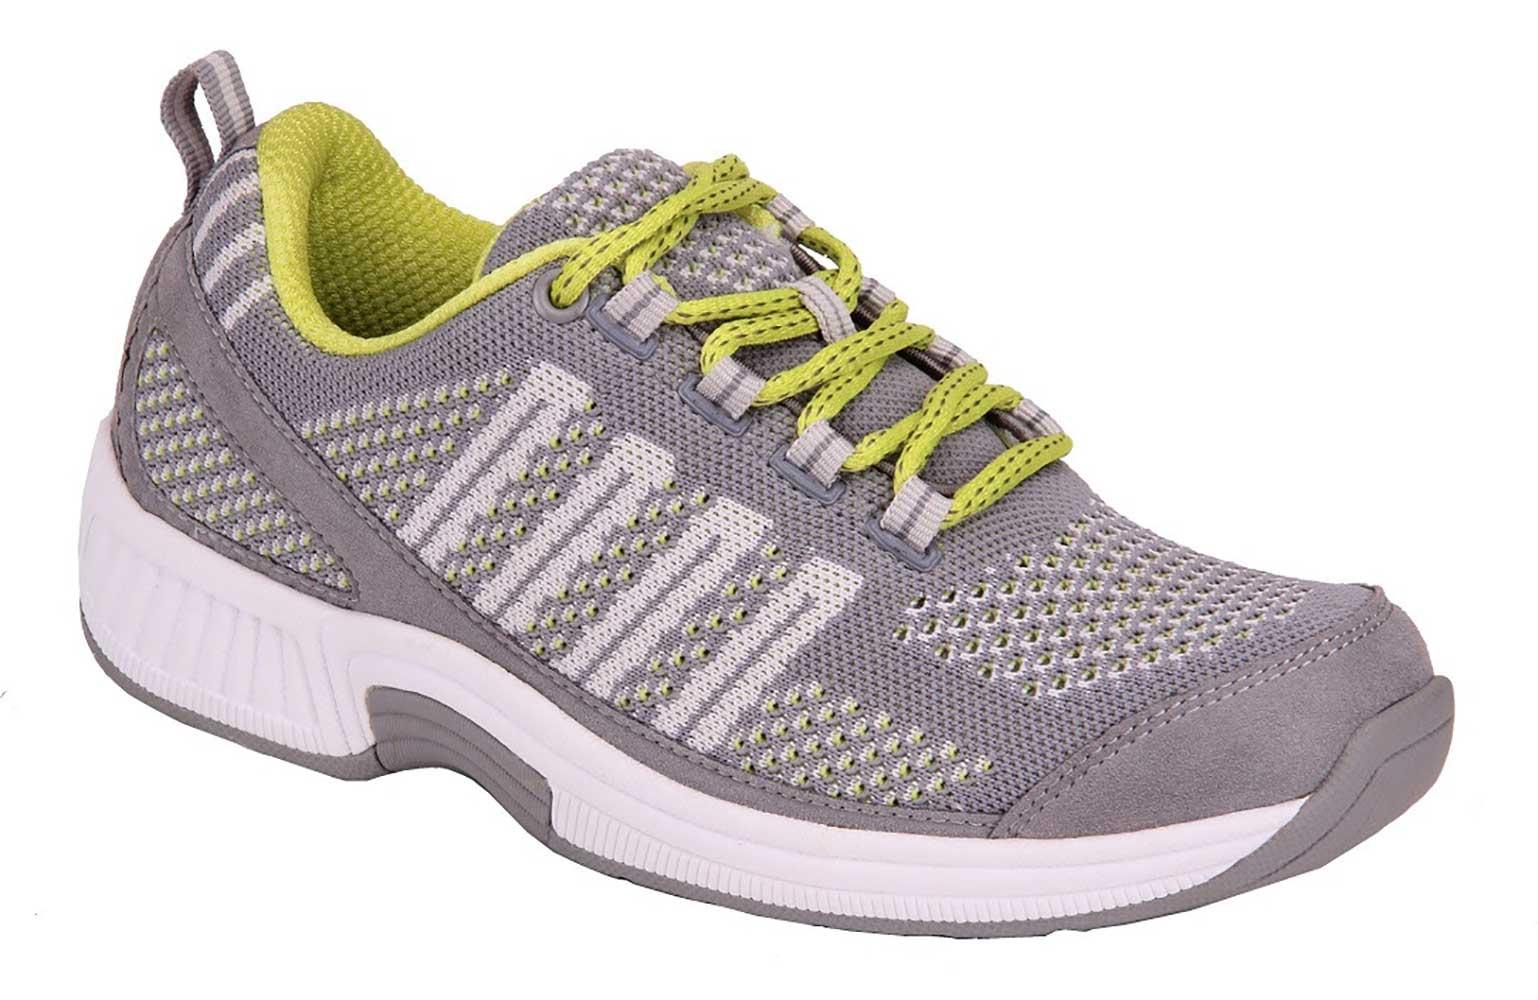 60547e471d0234 Reebok Walk Ultra V Dmx Max 2e Mens 409 LRG 2e walking shoes